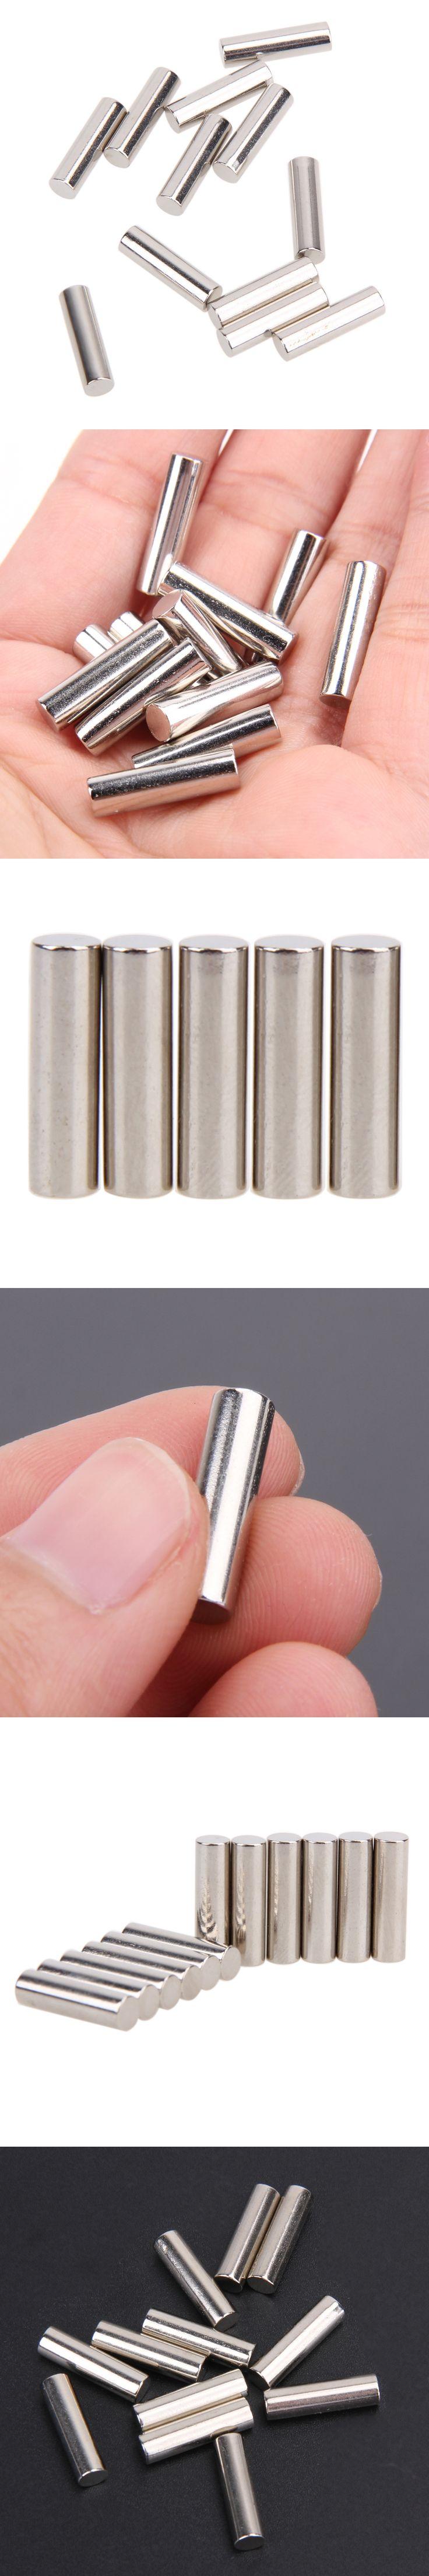 12pcs/set Electric Guitar Humbucker Pickup Polepiece Pole Slug Magnet Slug Rods Guitar Parts and Accessories